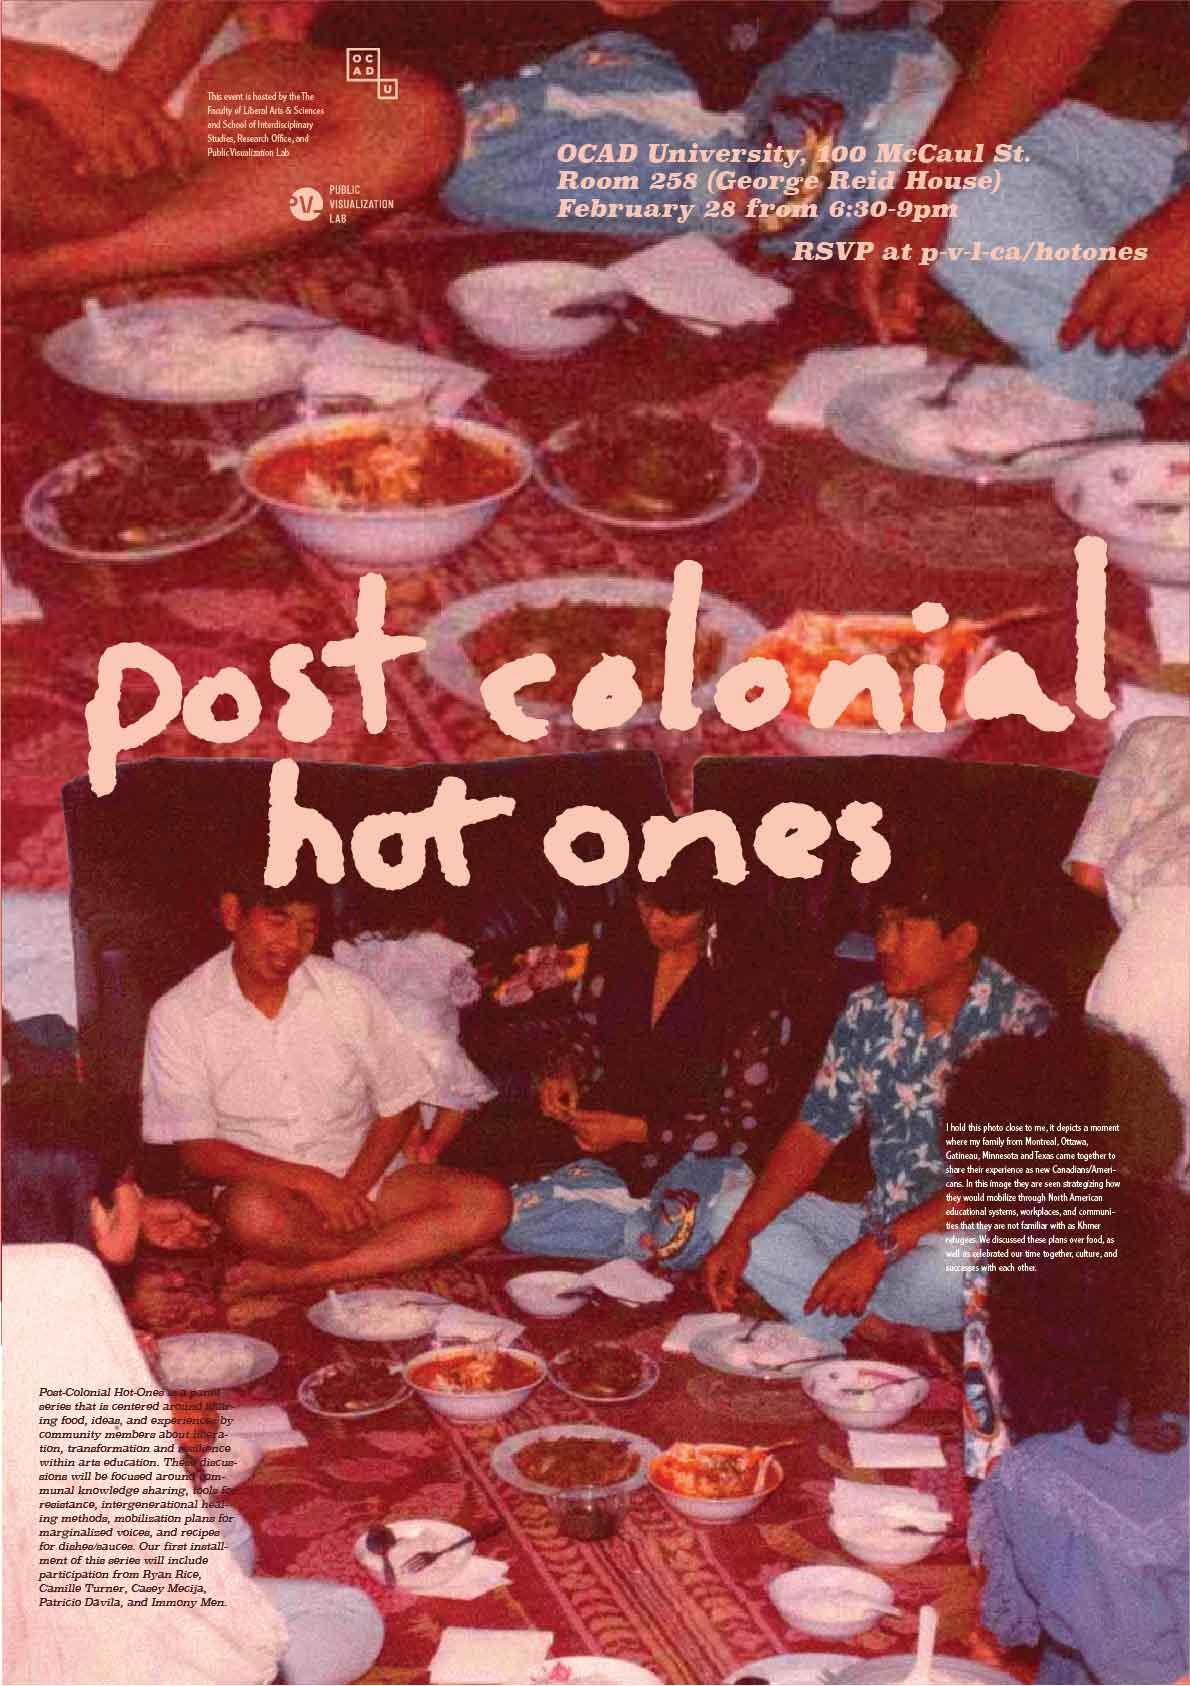 Postcolonial Hot Ones